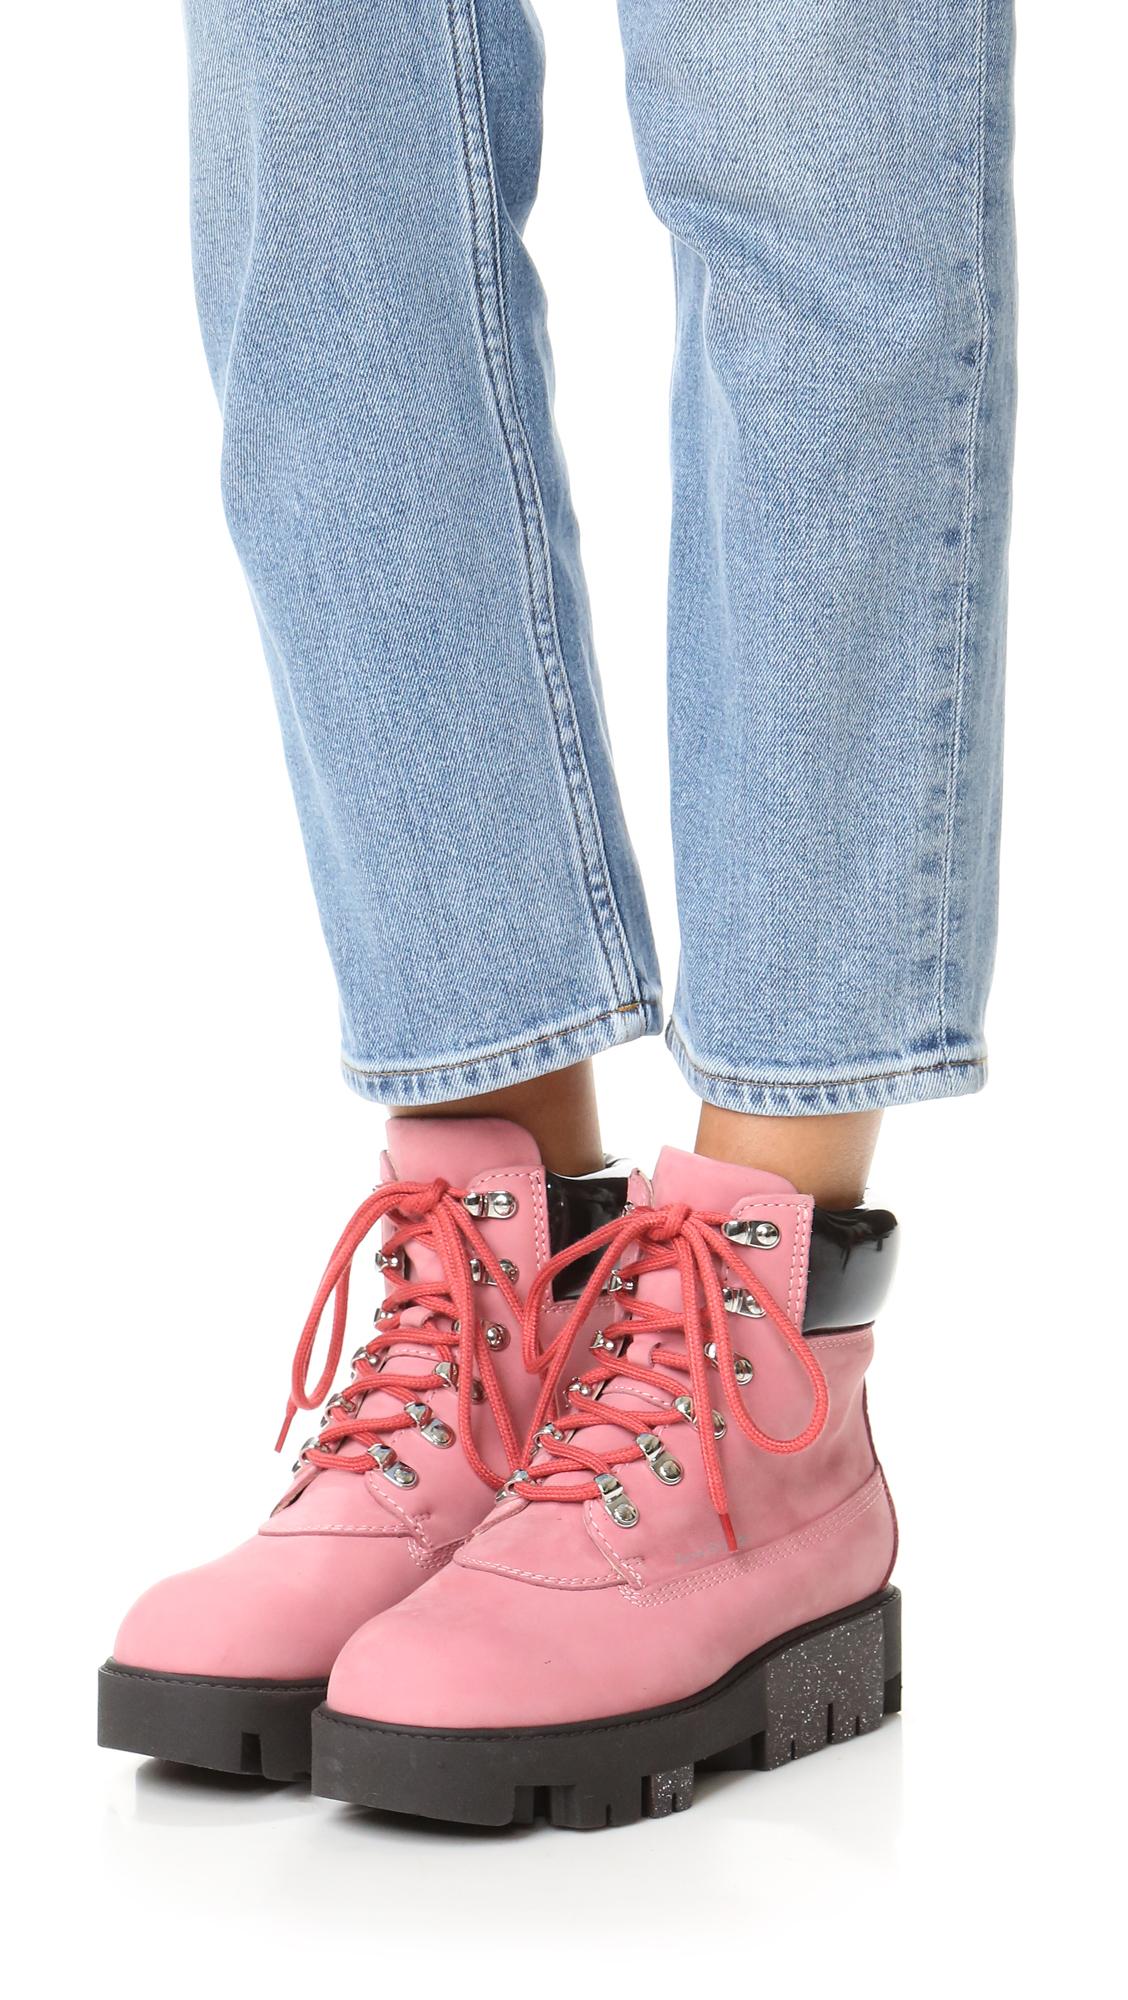 b24229a8ad5 Acne Studios Pink Telde Hiking Booties